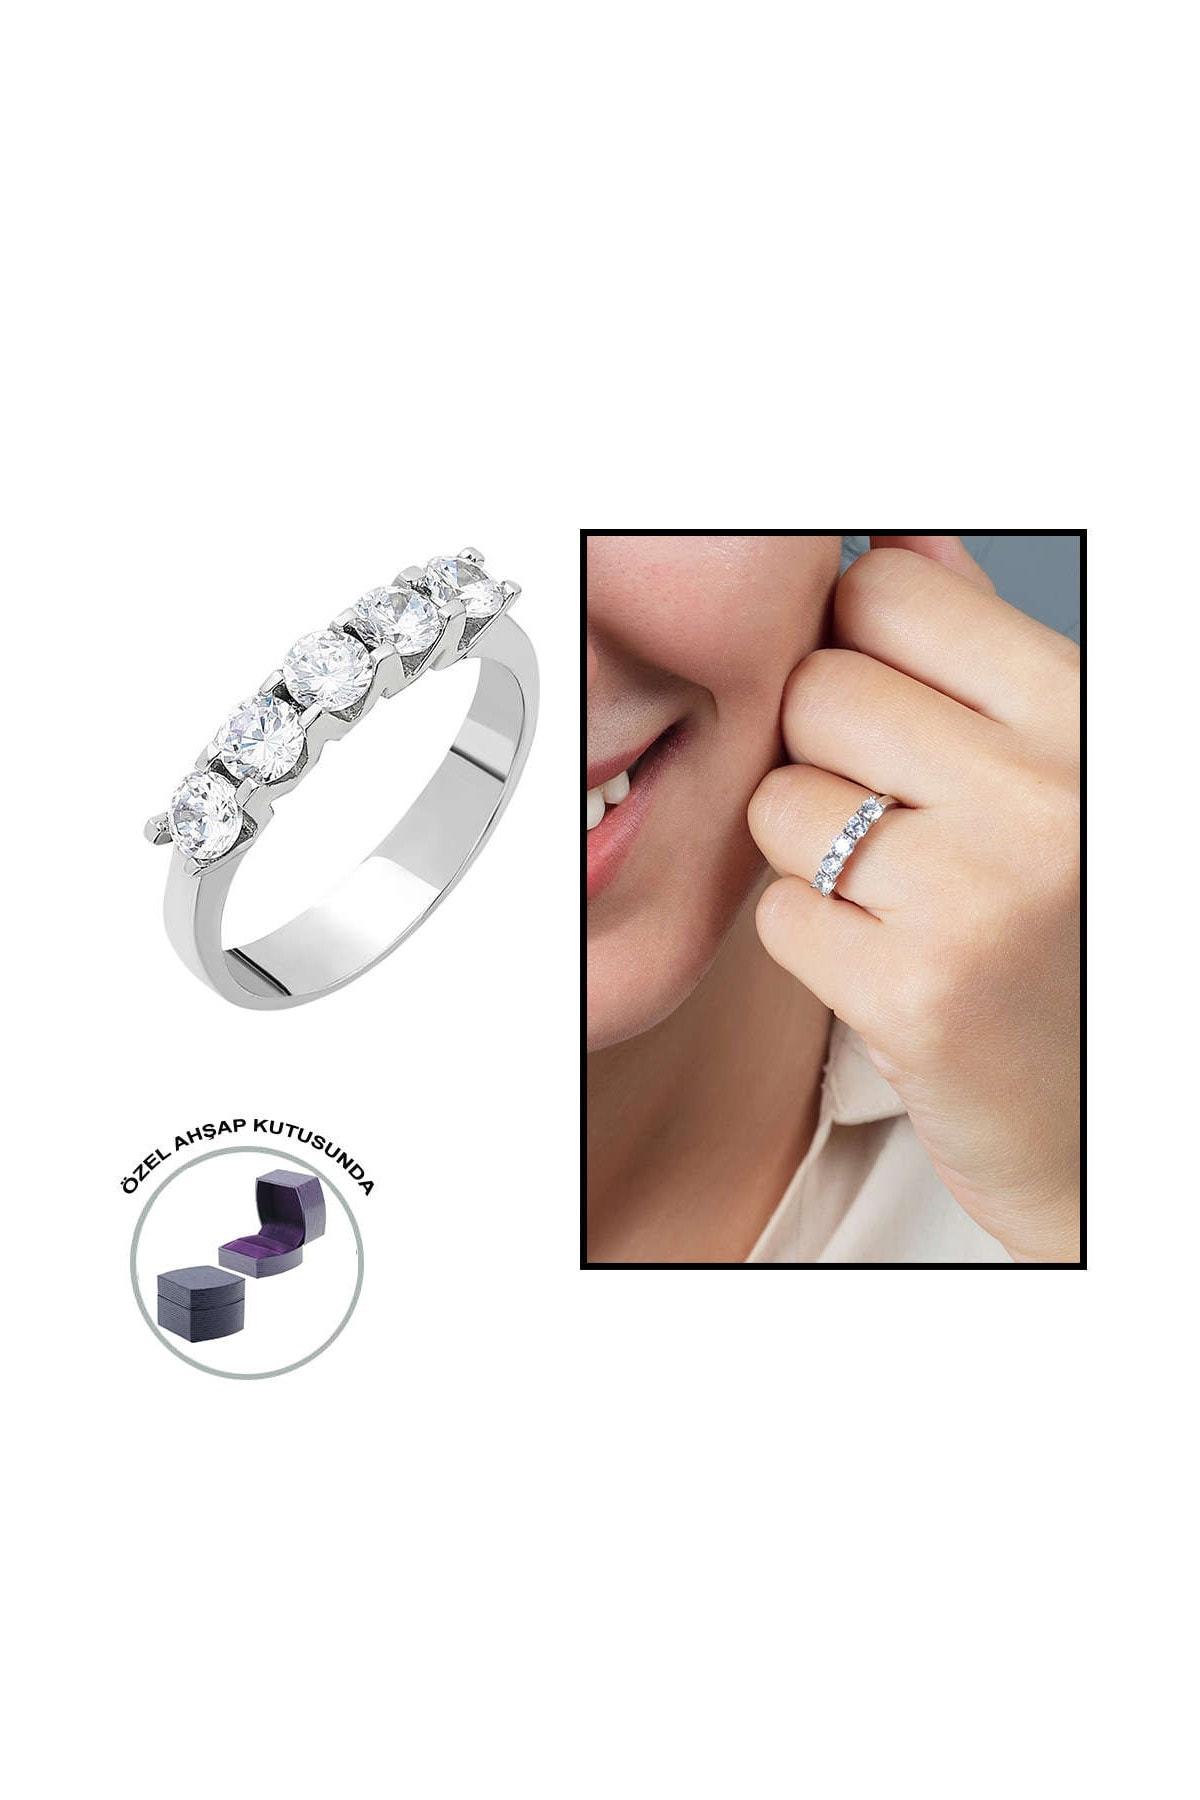 Tesbihane Starlight Diamond Pırlanta Montür Mini Tasarım 925 Ayar Gümüş Bayan Beştaş Yüzük 102001809 0